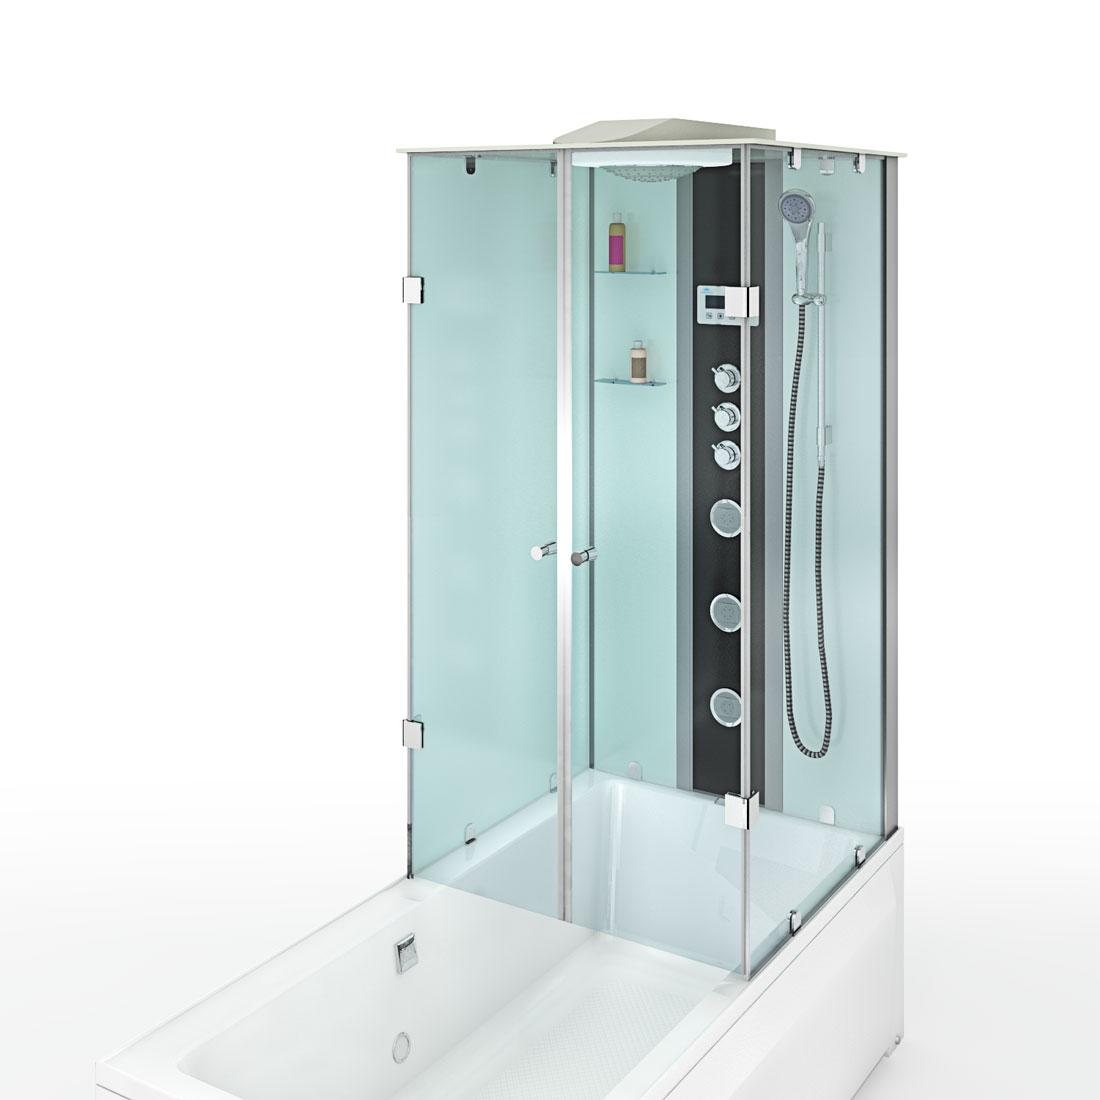 acquavapore dtp50 a005l dusch wannen kombi in 180x90cm trendbad24. Black Bedroom Furniture Sets. Home Design Ideas